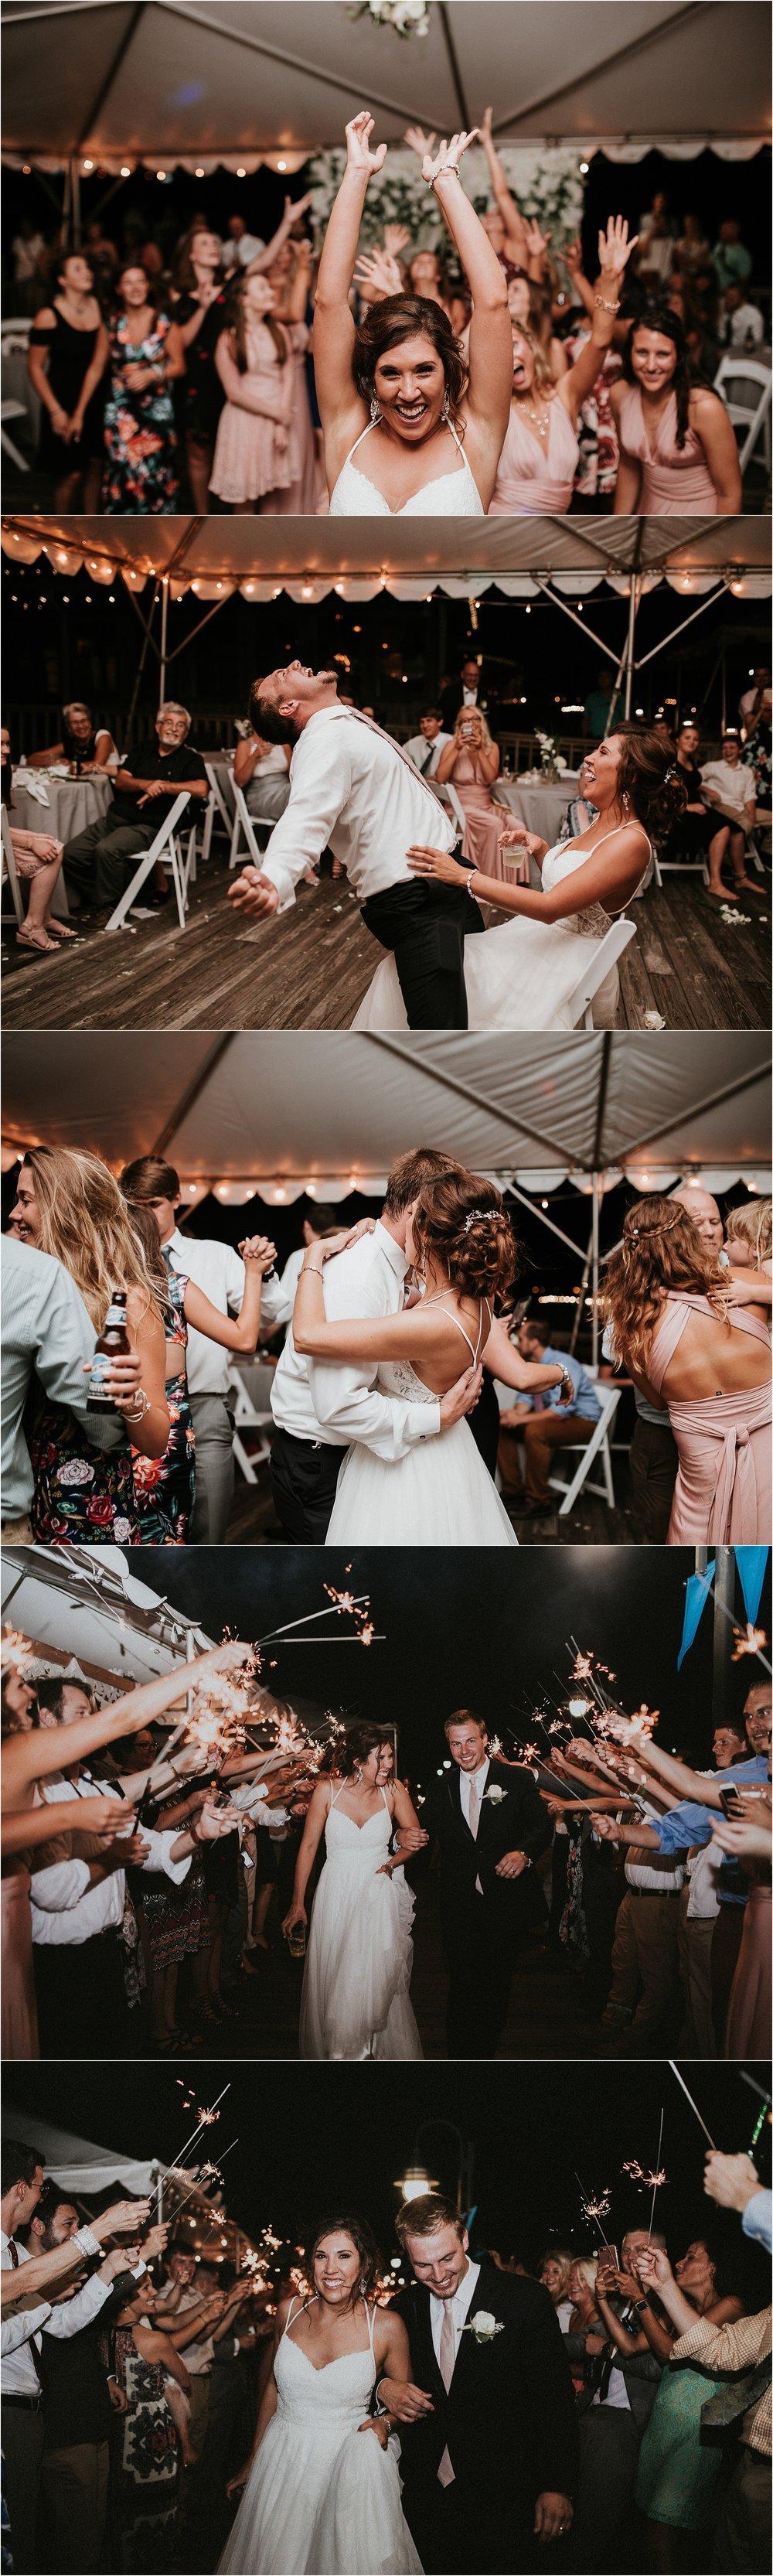 Riverwalk-Landing-wedding-wilmington-NC_0049.jpg